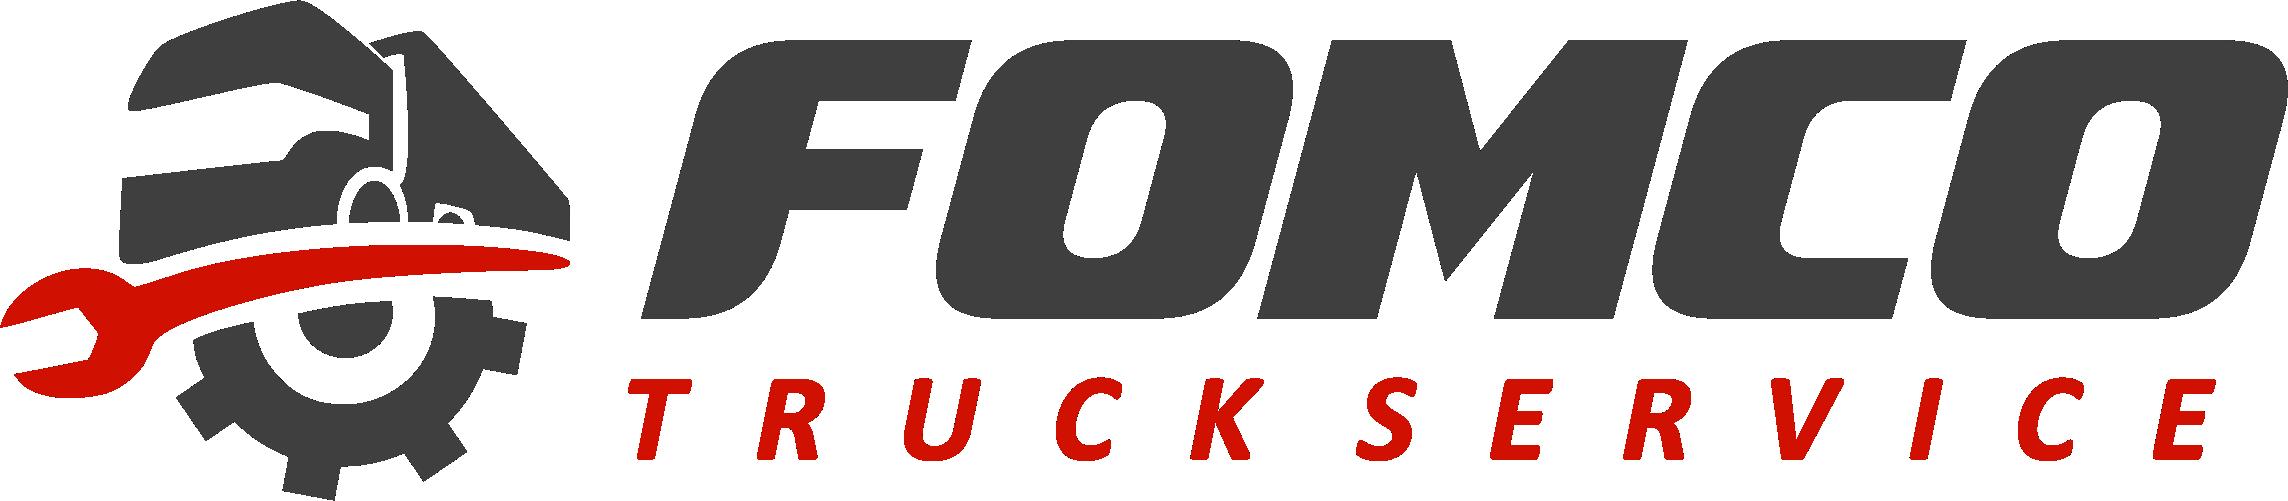 Logo Truck service